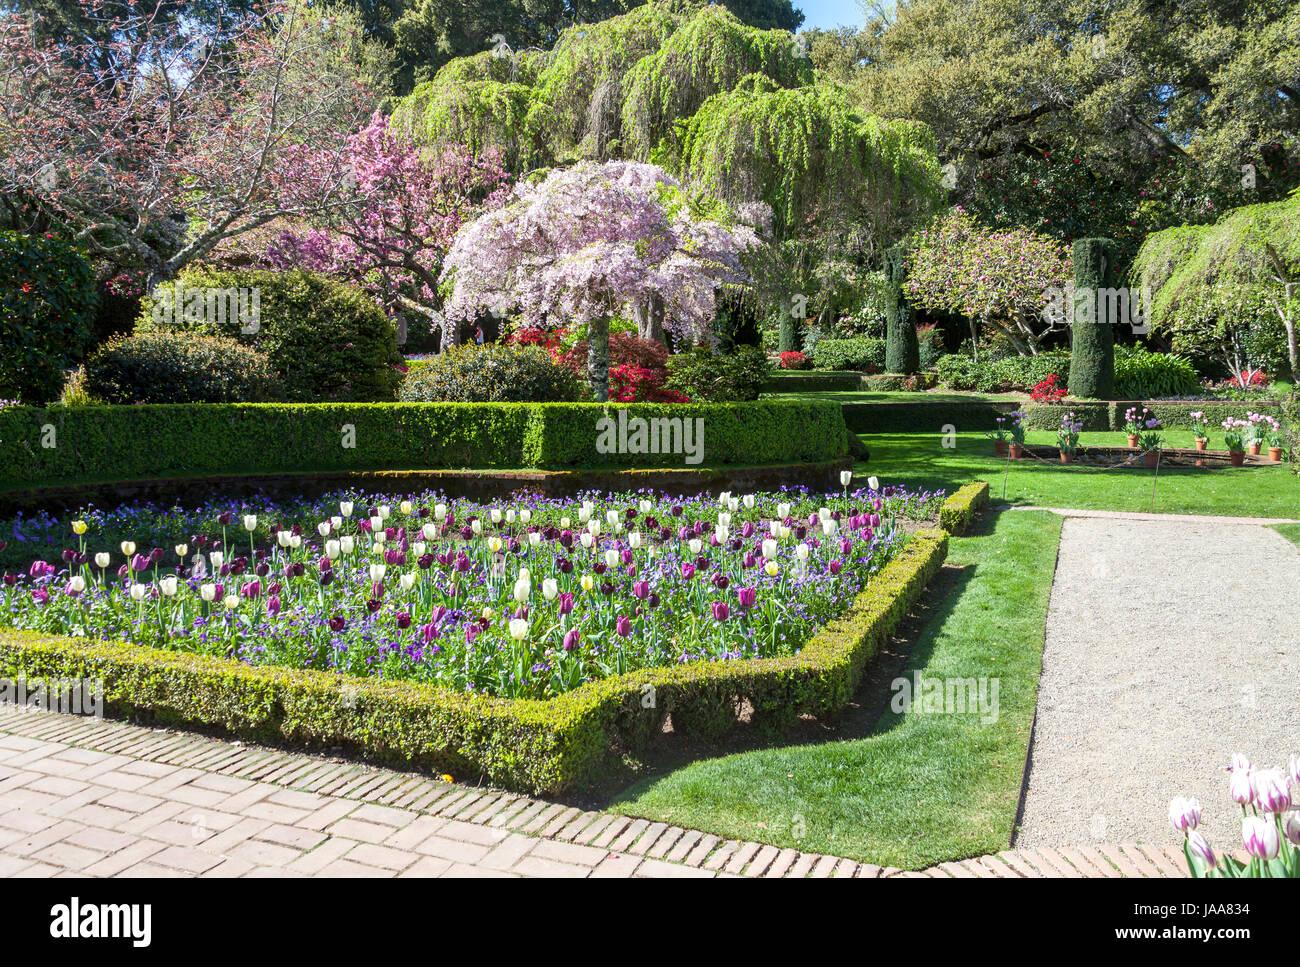 this image was taken at a formal garden near san francisco stock